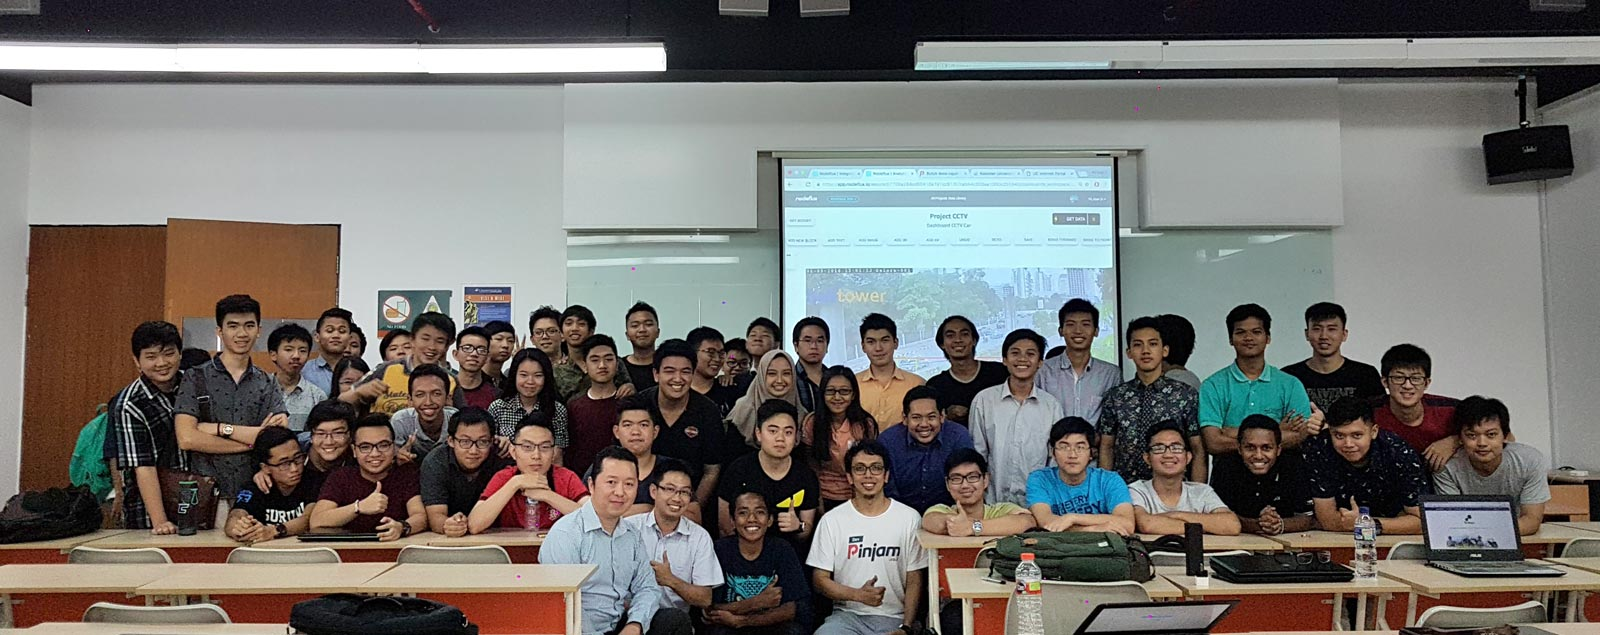 Foto bersama di akhir sesi kuliah tamu Internet of Things